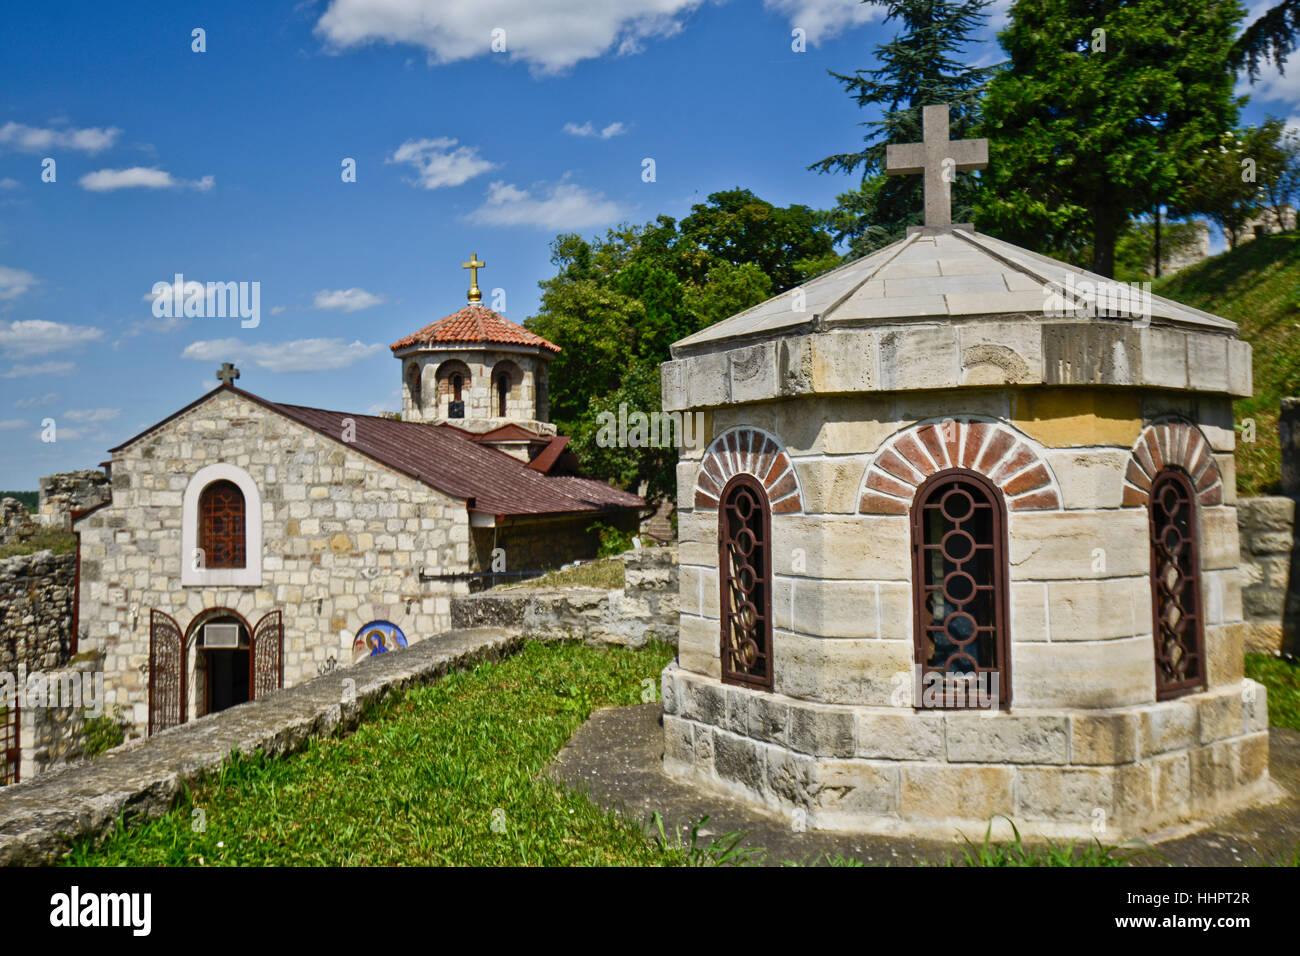 Belgrade Fortress, Kalemegdan, Serbia. Monastery and church - Stock Image